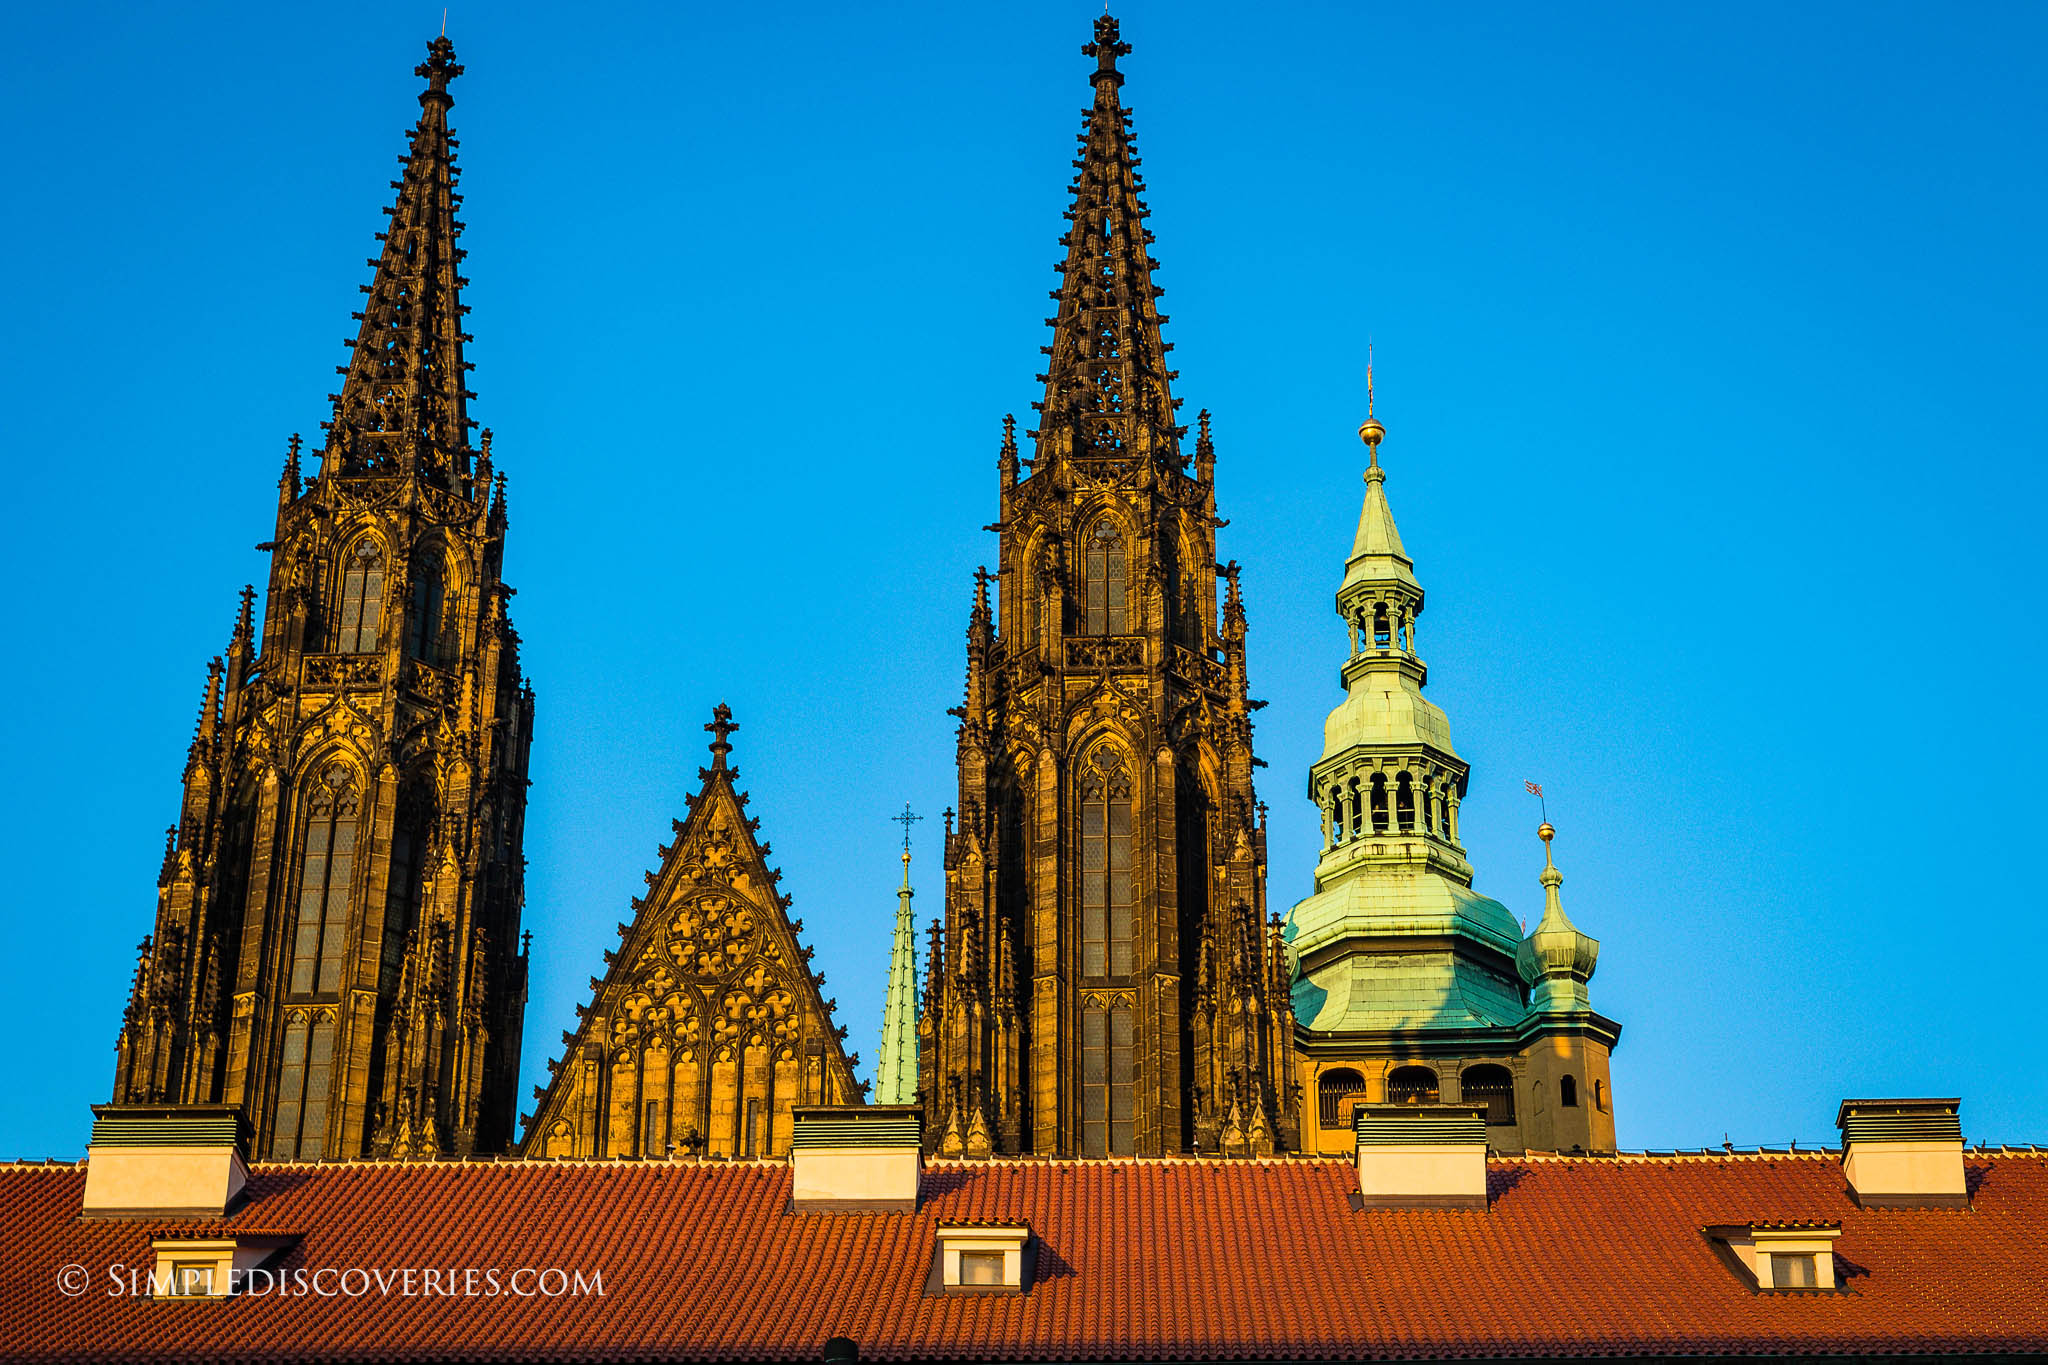 st_vitus_cathedral_spires_prague